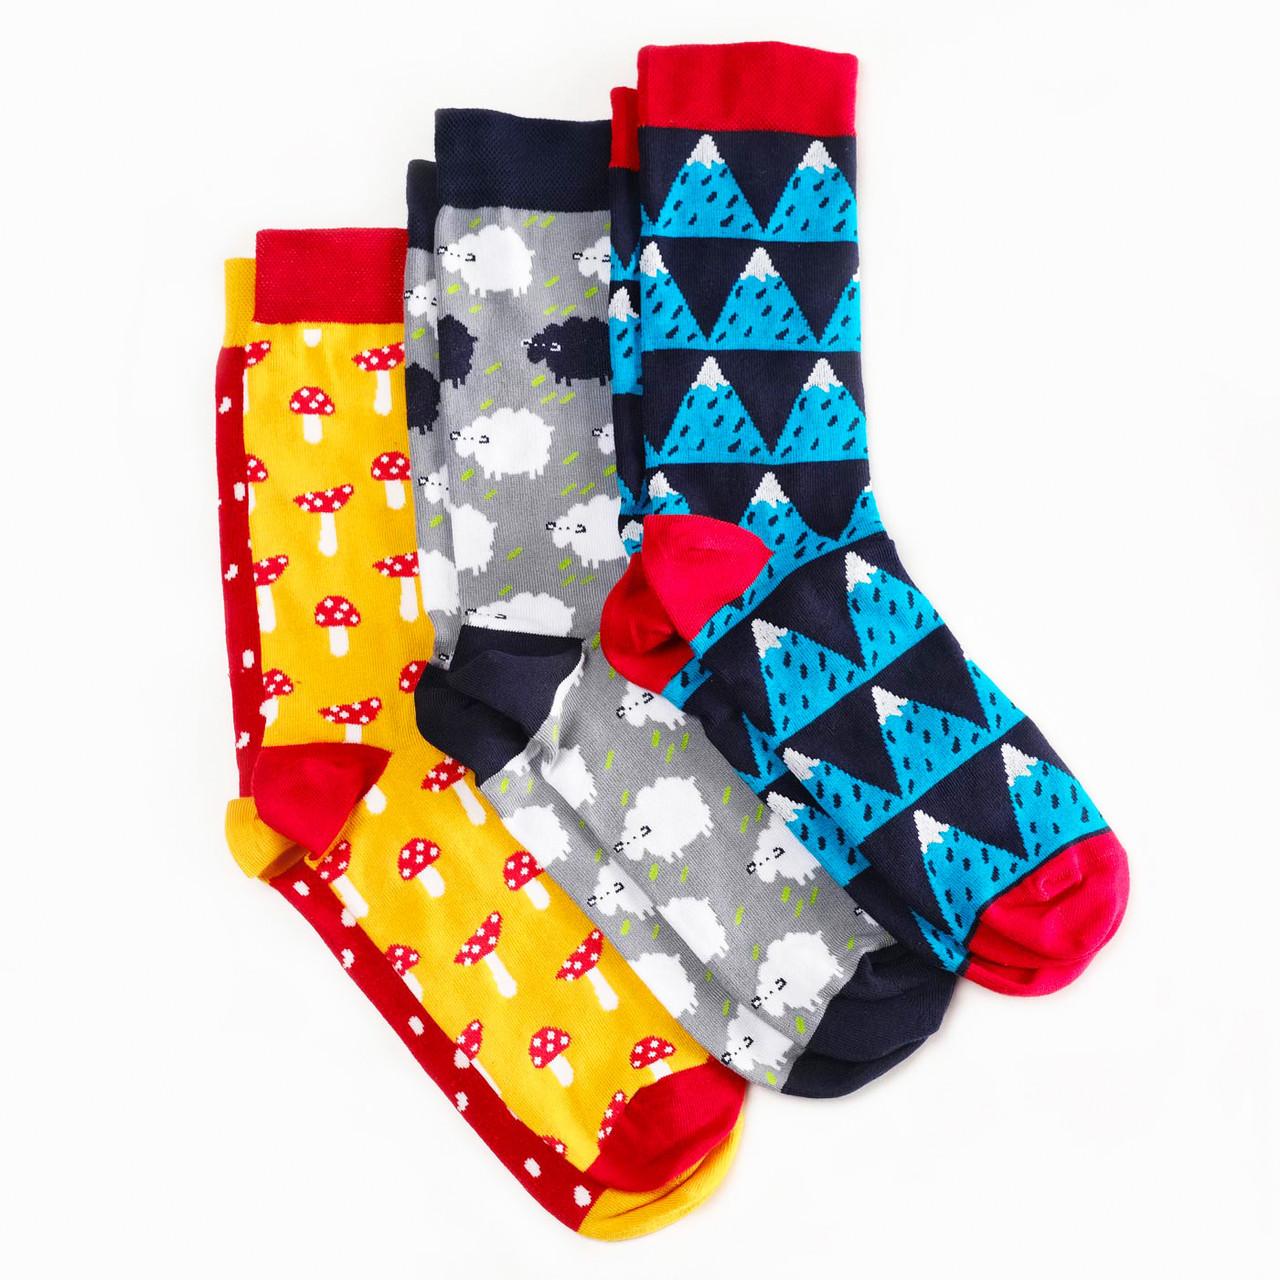 Носки Dodo Socks набор Yukon 39-41, 3 шт